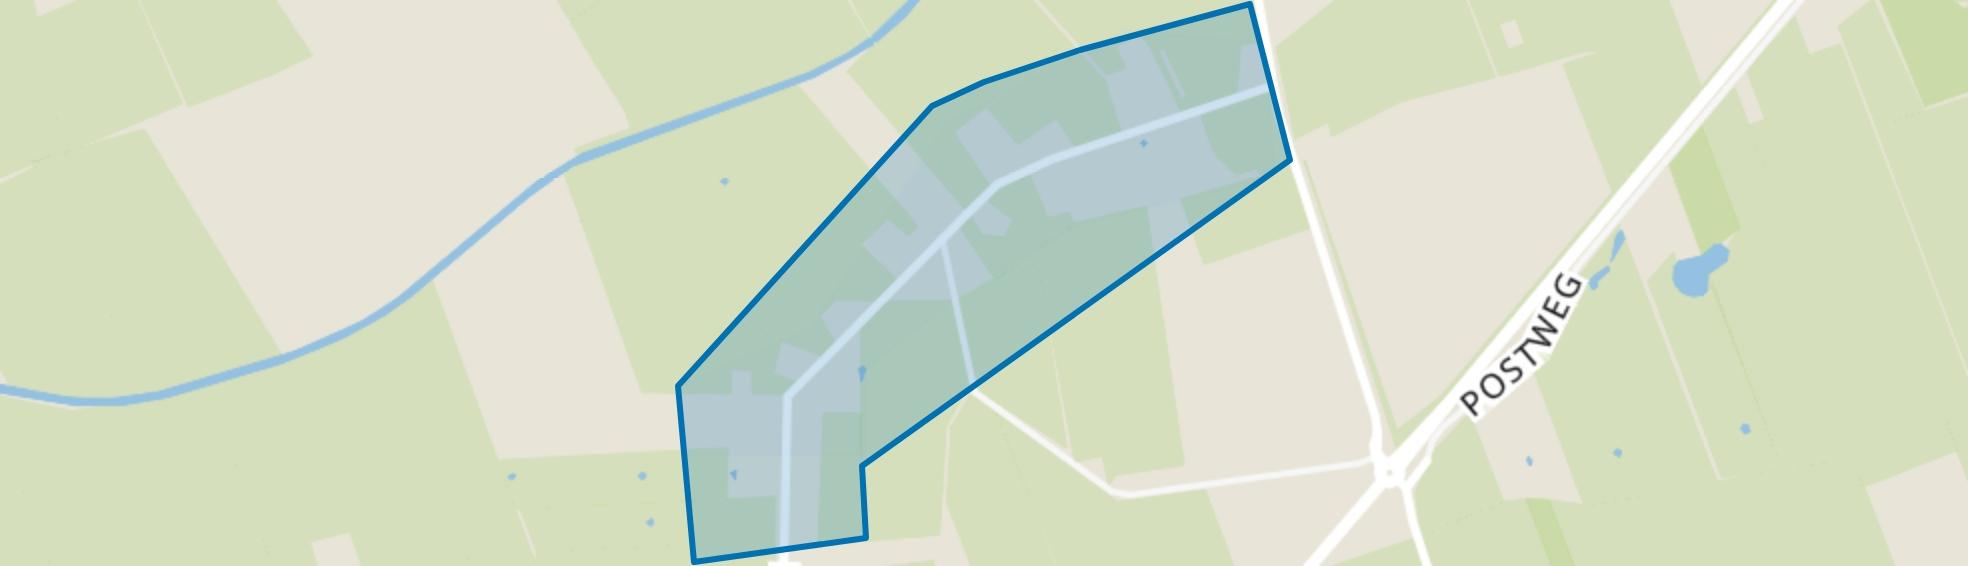 Hees, Ruinen (Gem. De Wolden) map